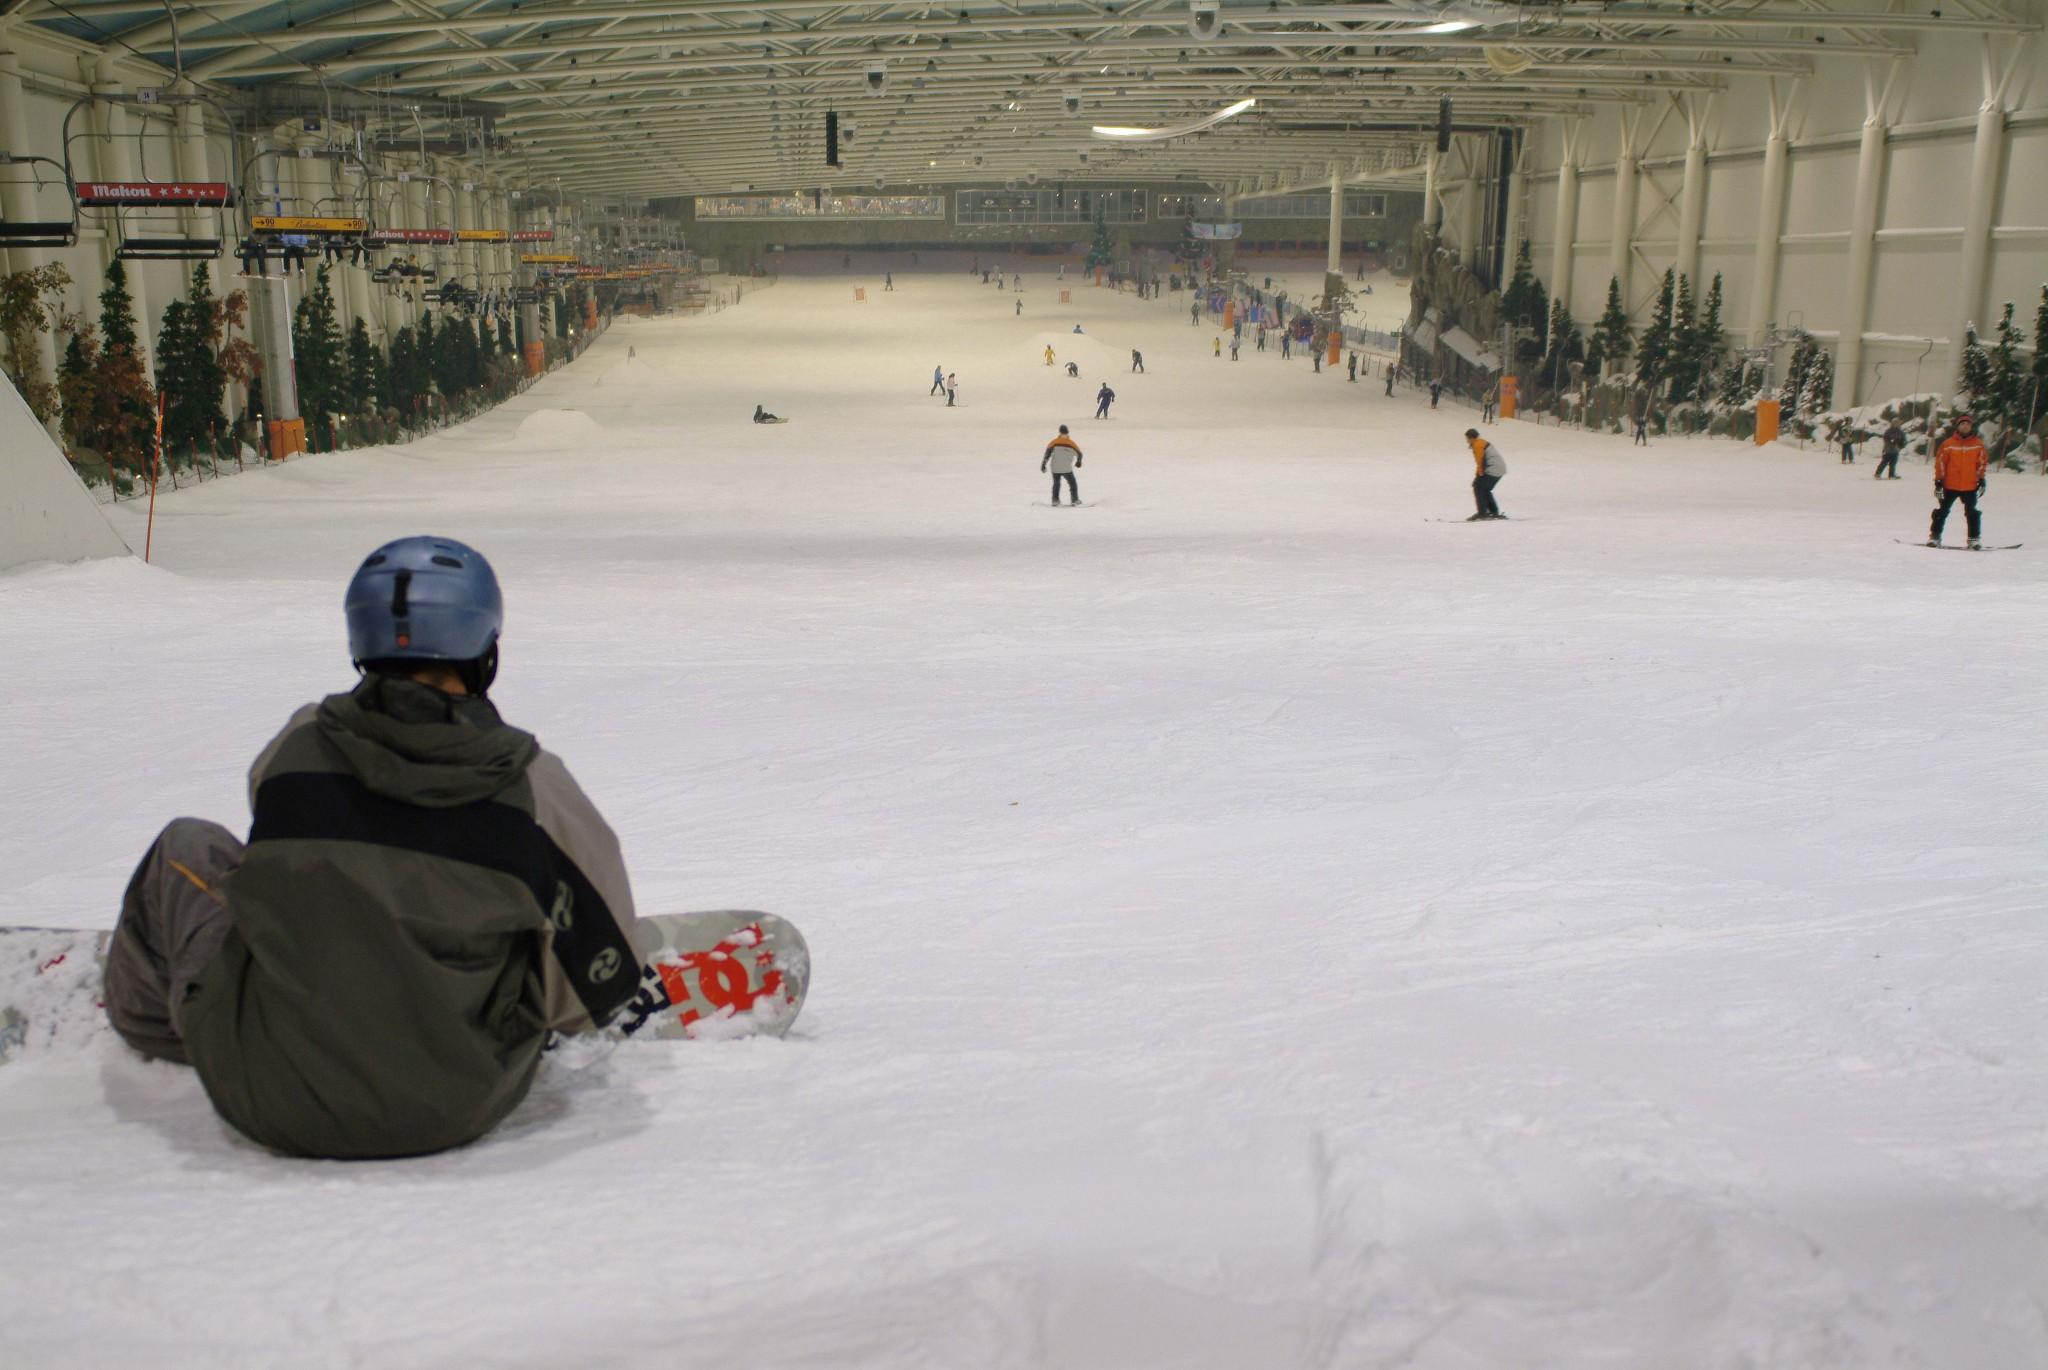 New Indoor Snow Centre For Saudi Arabia Inthesnow